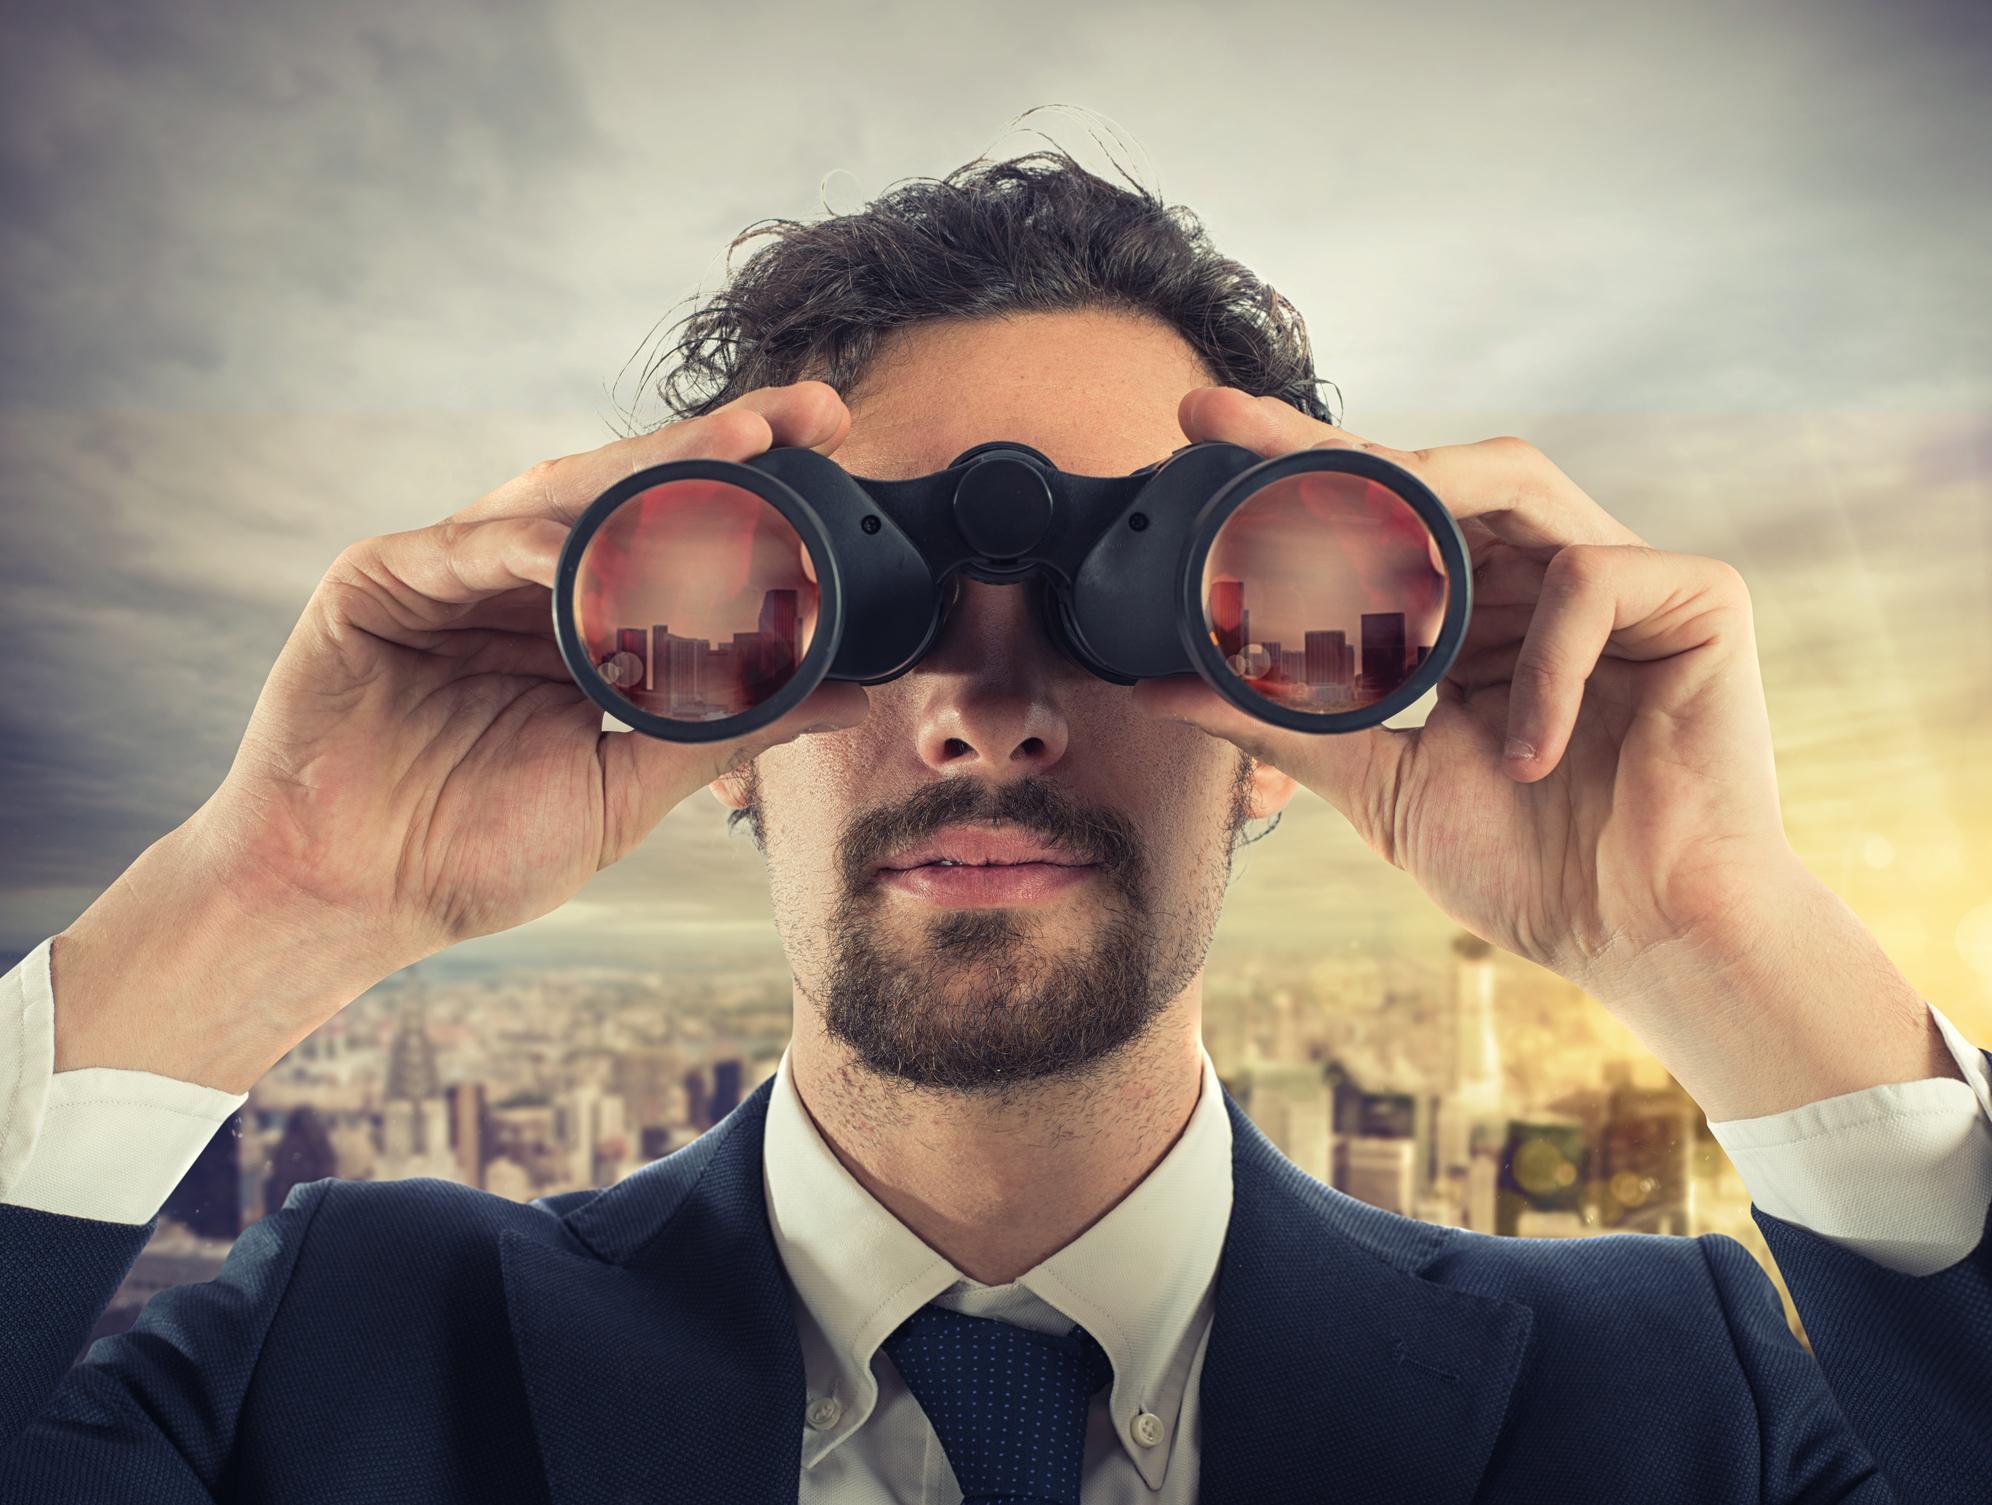 A man in a suit looking through binoculars.